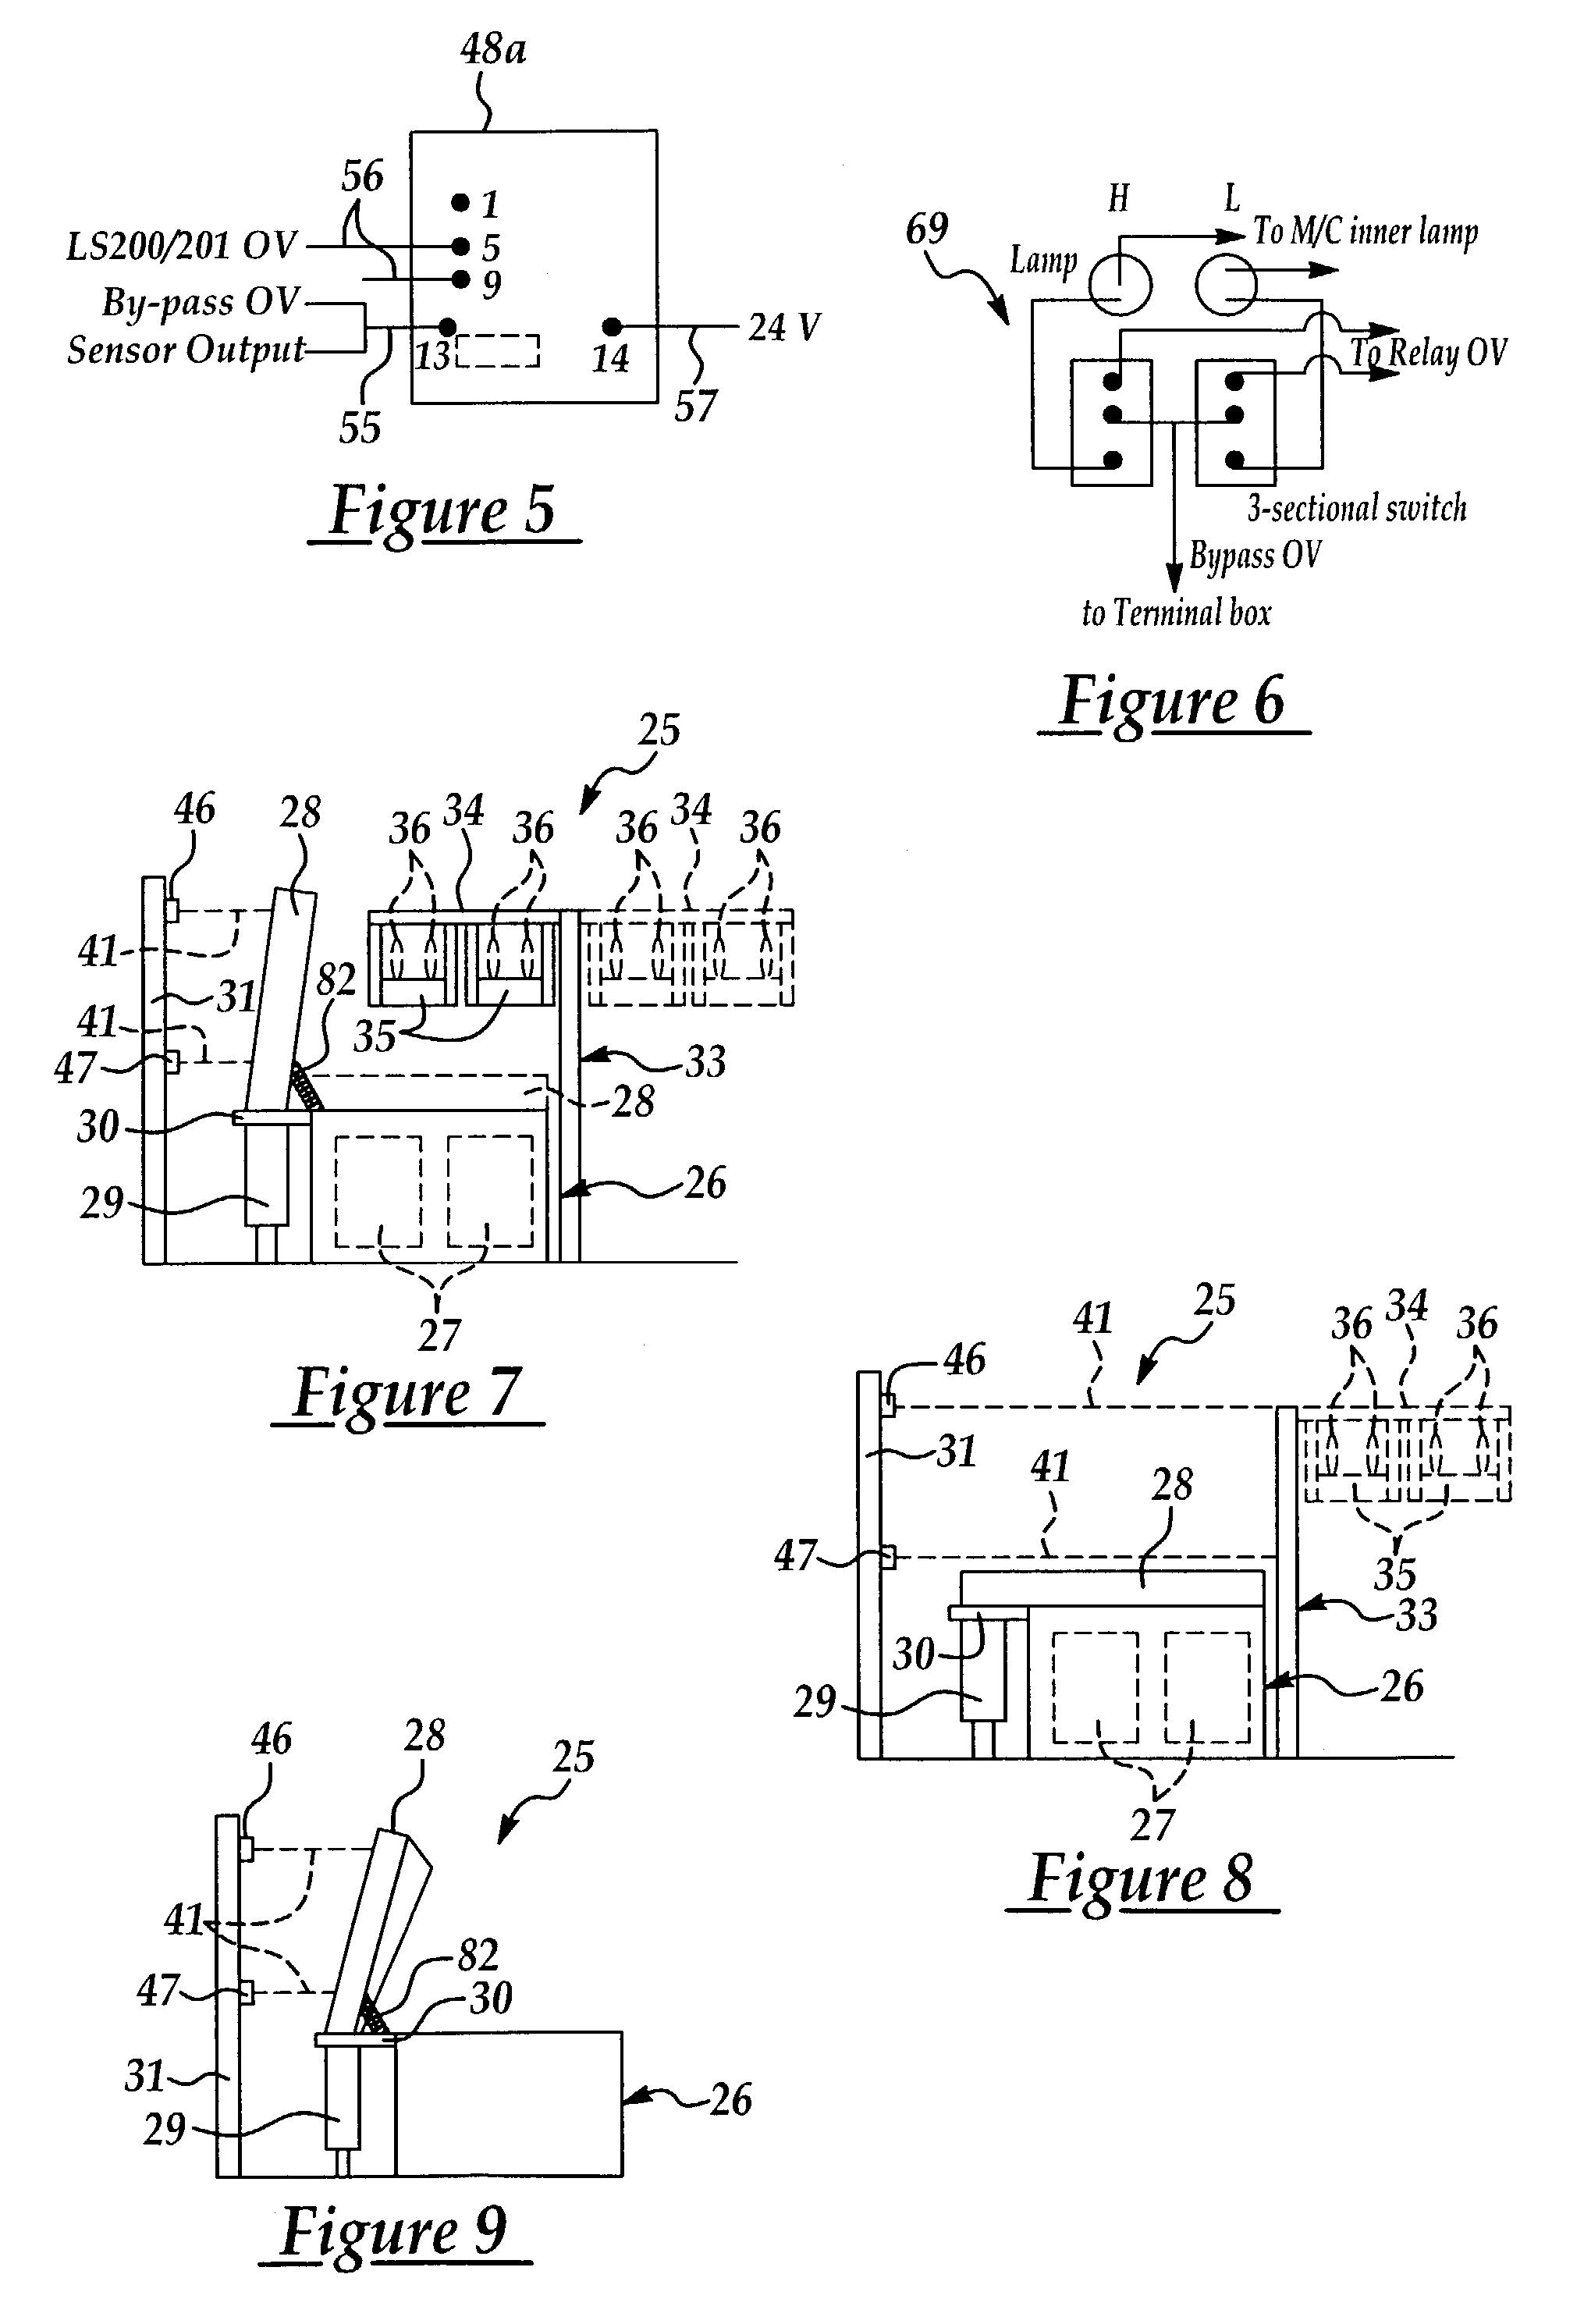 Diagram Album Omron Plc Wiring Diagram - Millions Diagram ... on potter brumfield relay schematic, allen bradley relay schematic, idec relay schematic,